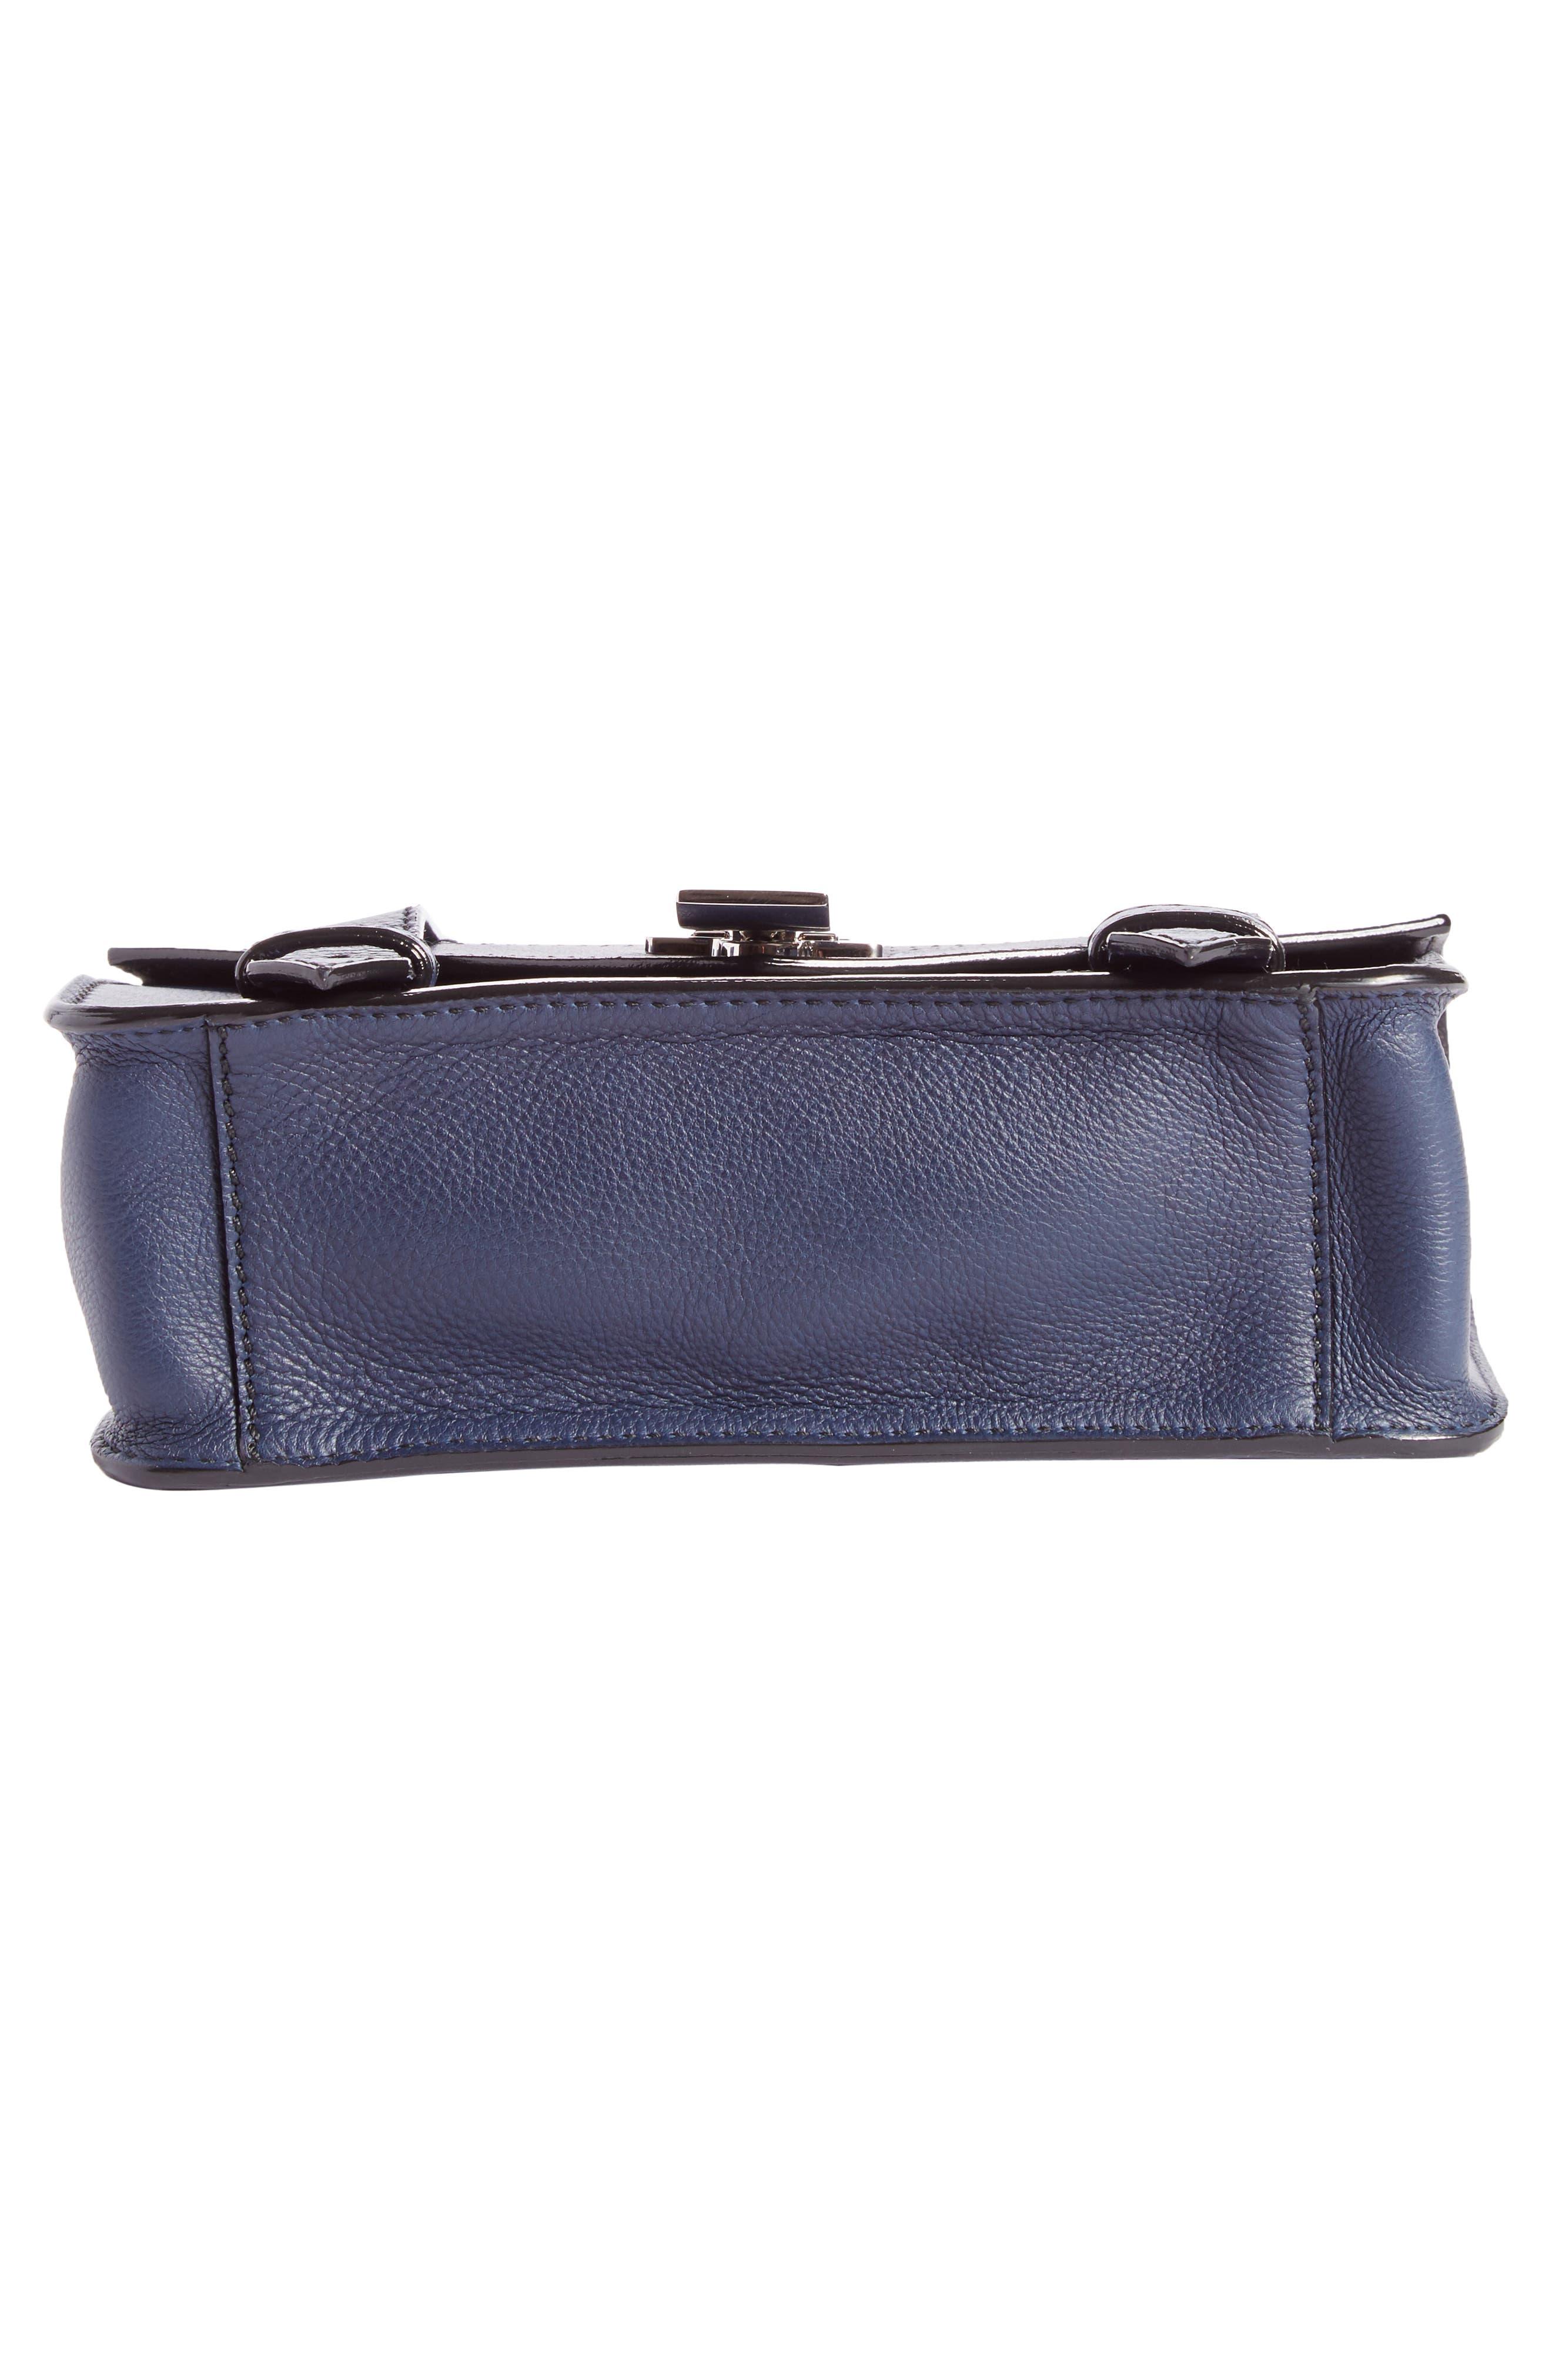 Mini PS1 Leather Crossbody Bag,                             Alternate thumbnail 5, color,                             Indigo